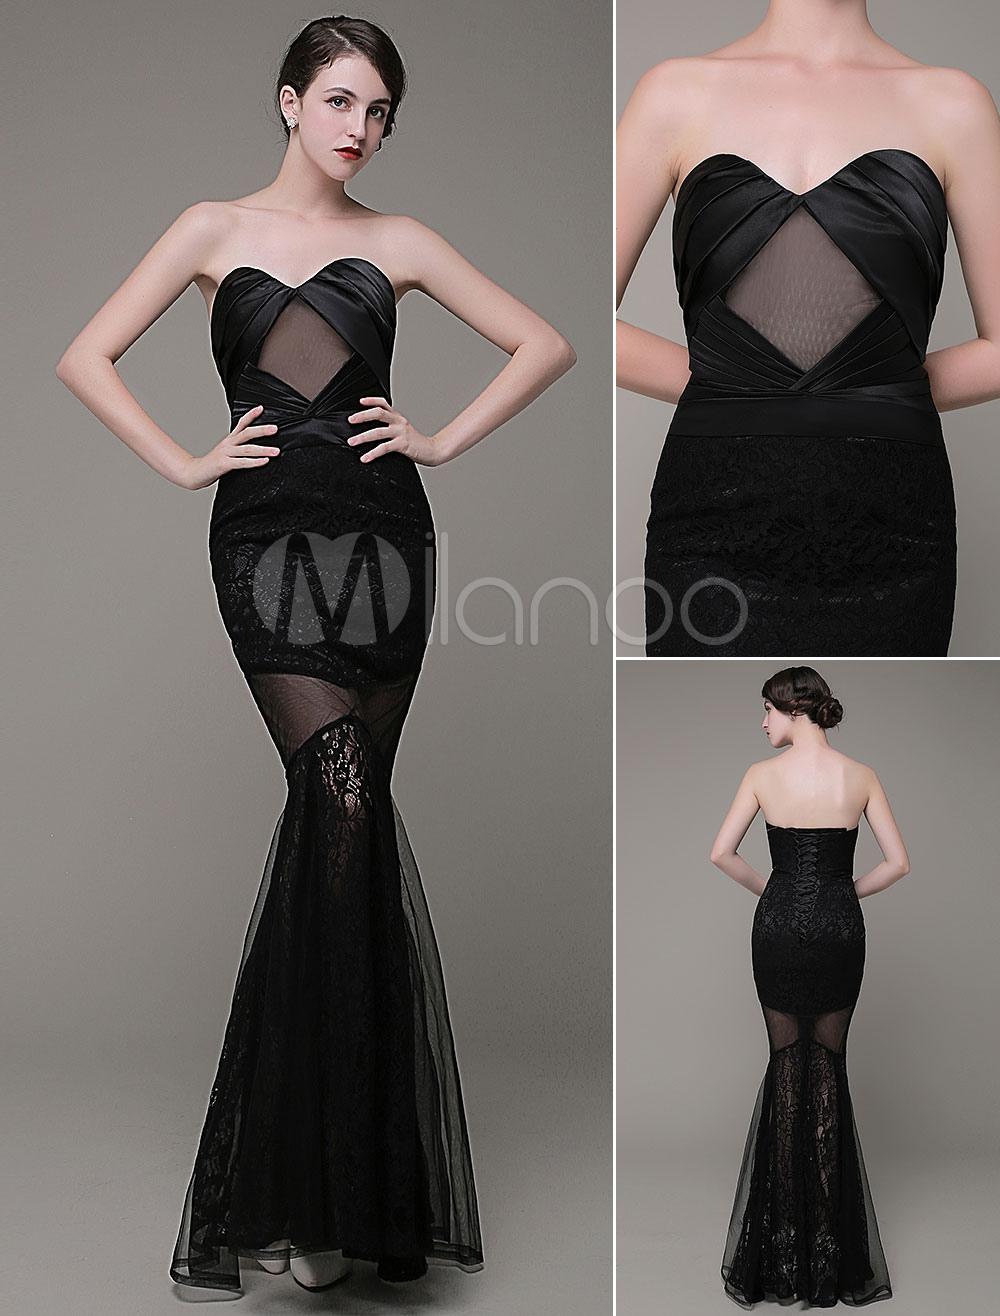 Mermaid Evening Dress Satin Sweatheart Pleated Iluusion Lace Flower Length Prom Dress Milanoo